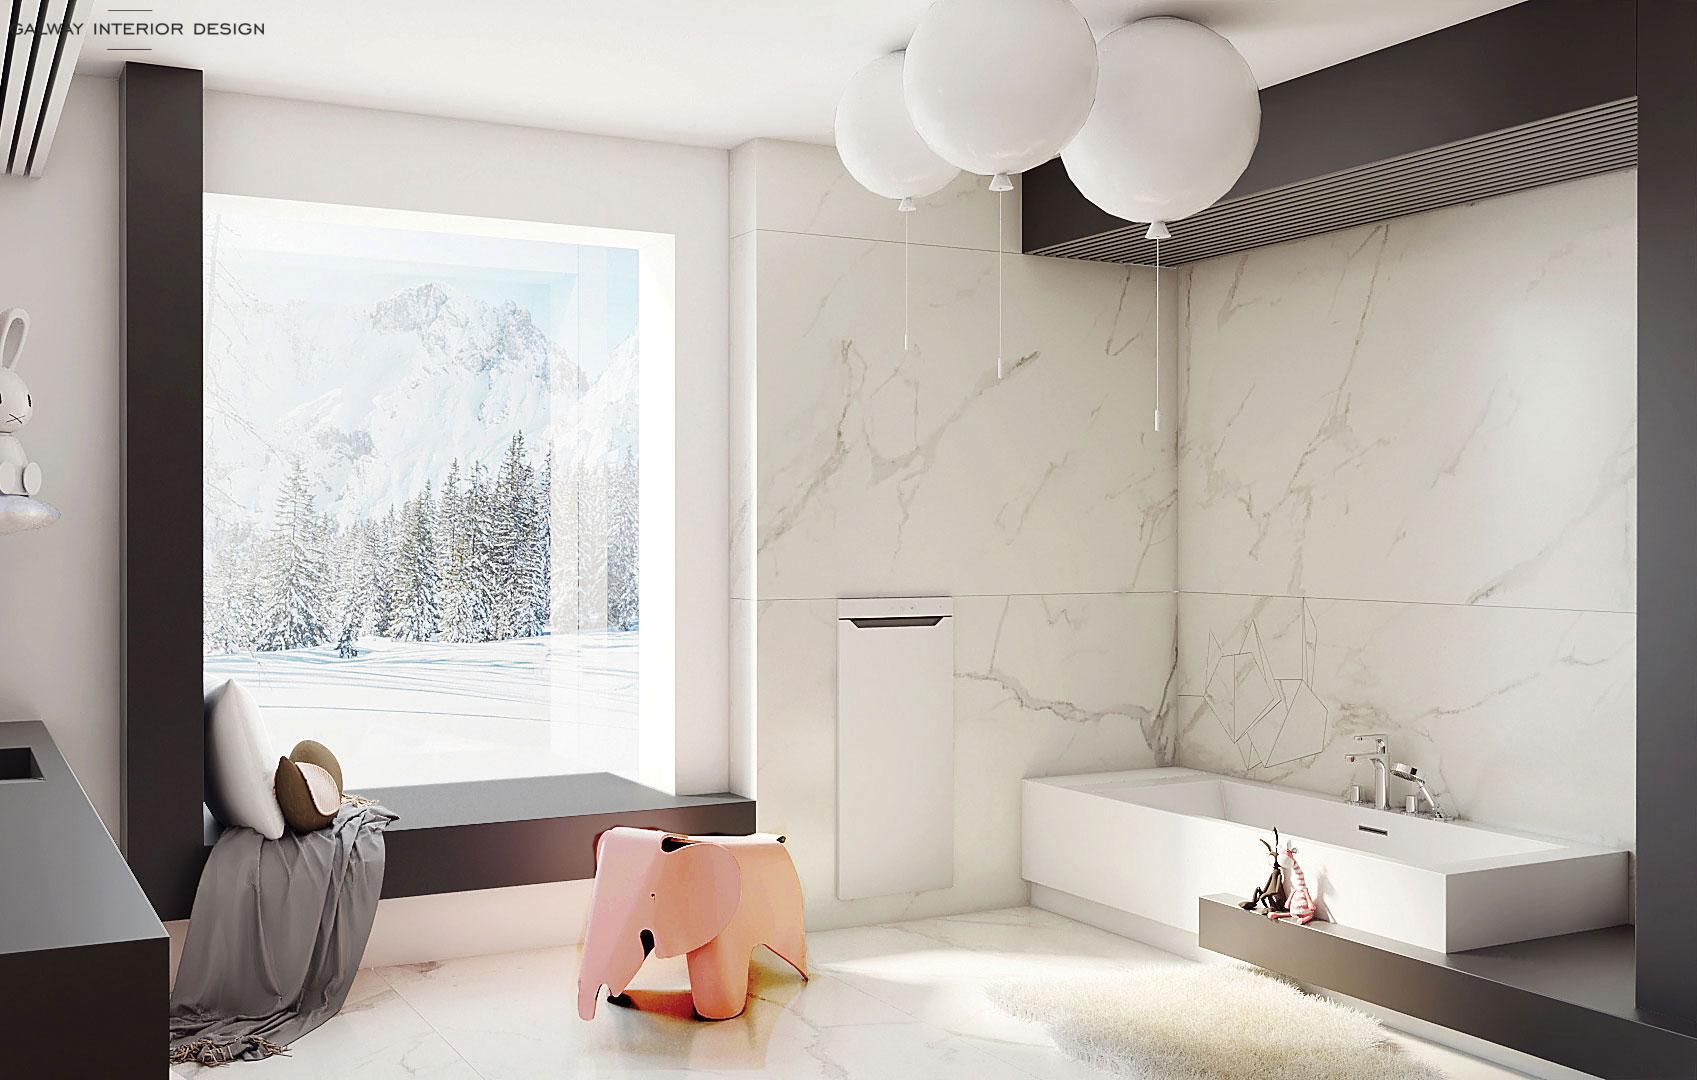 Galway Interior Design Big Kids Bathroom 1